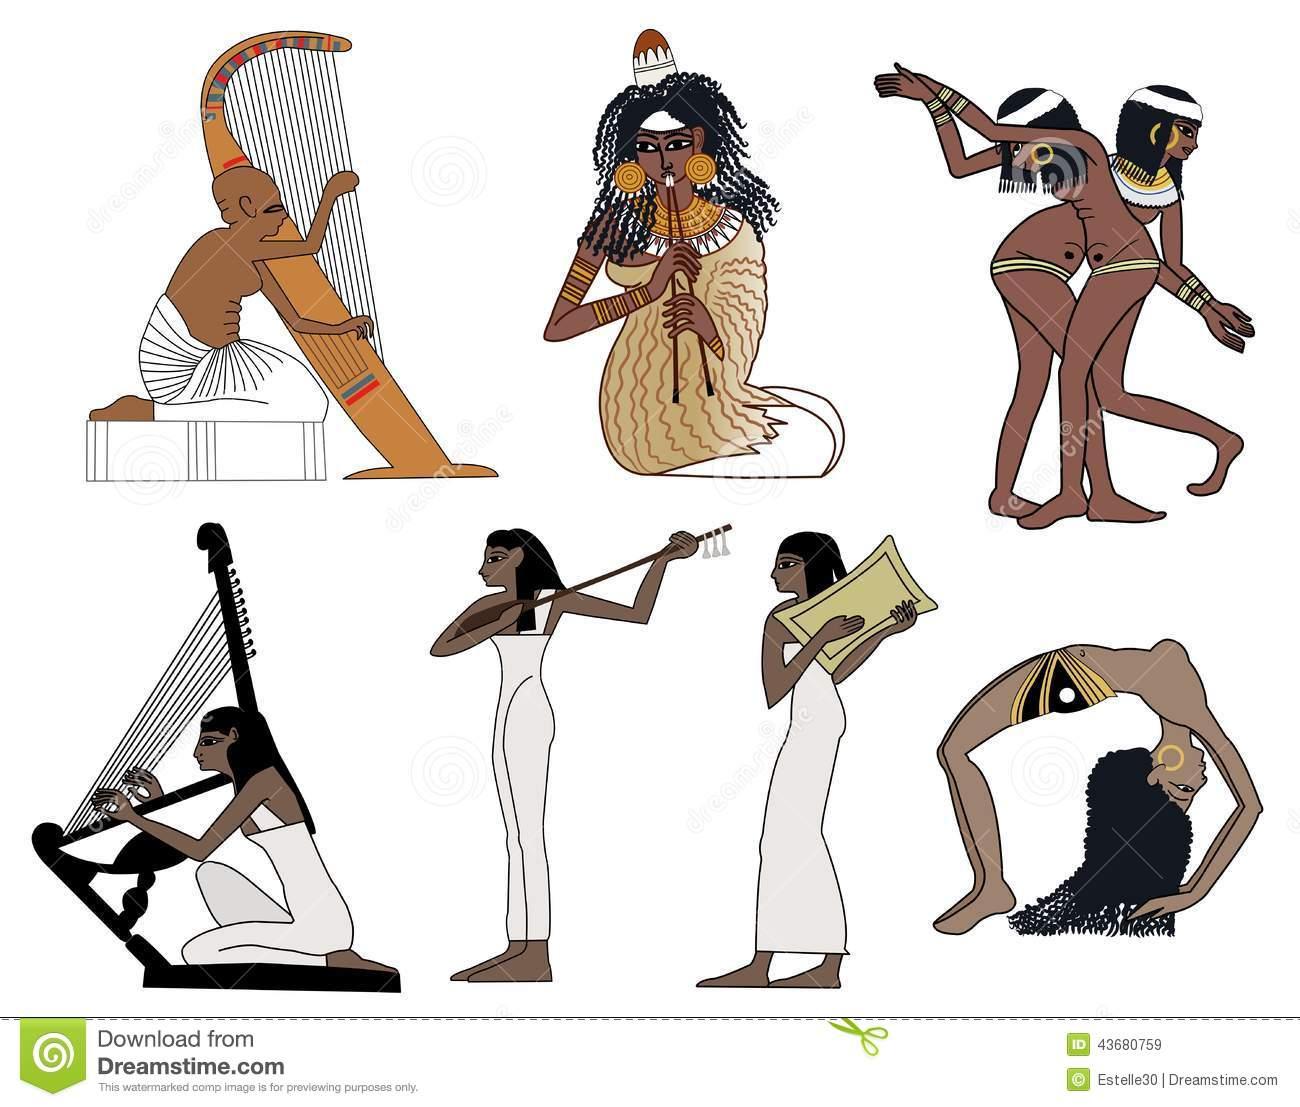 Danse clipart egyption Dance music Clip clipart Egyptian